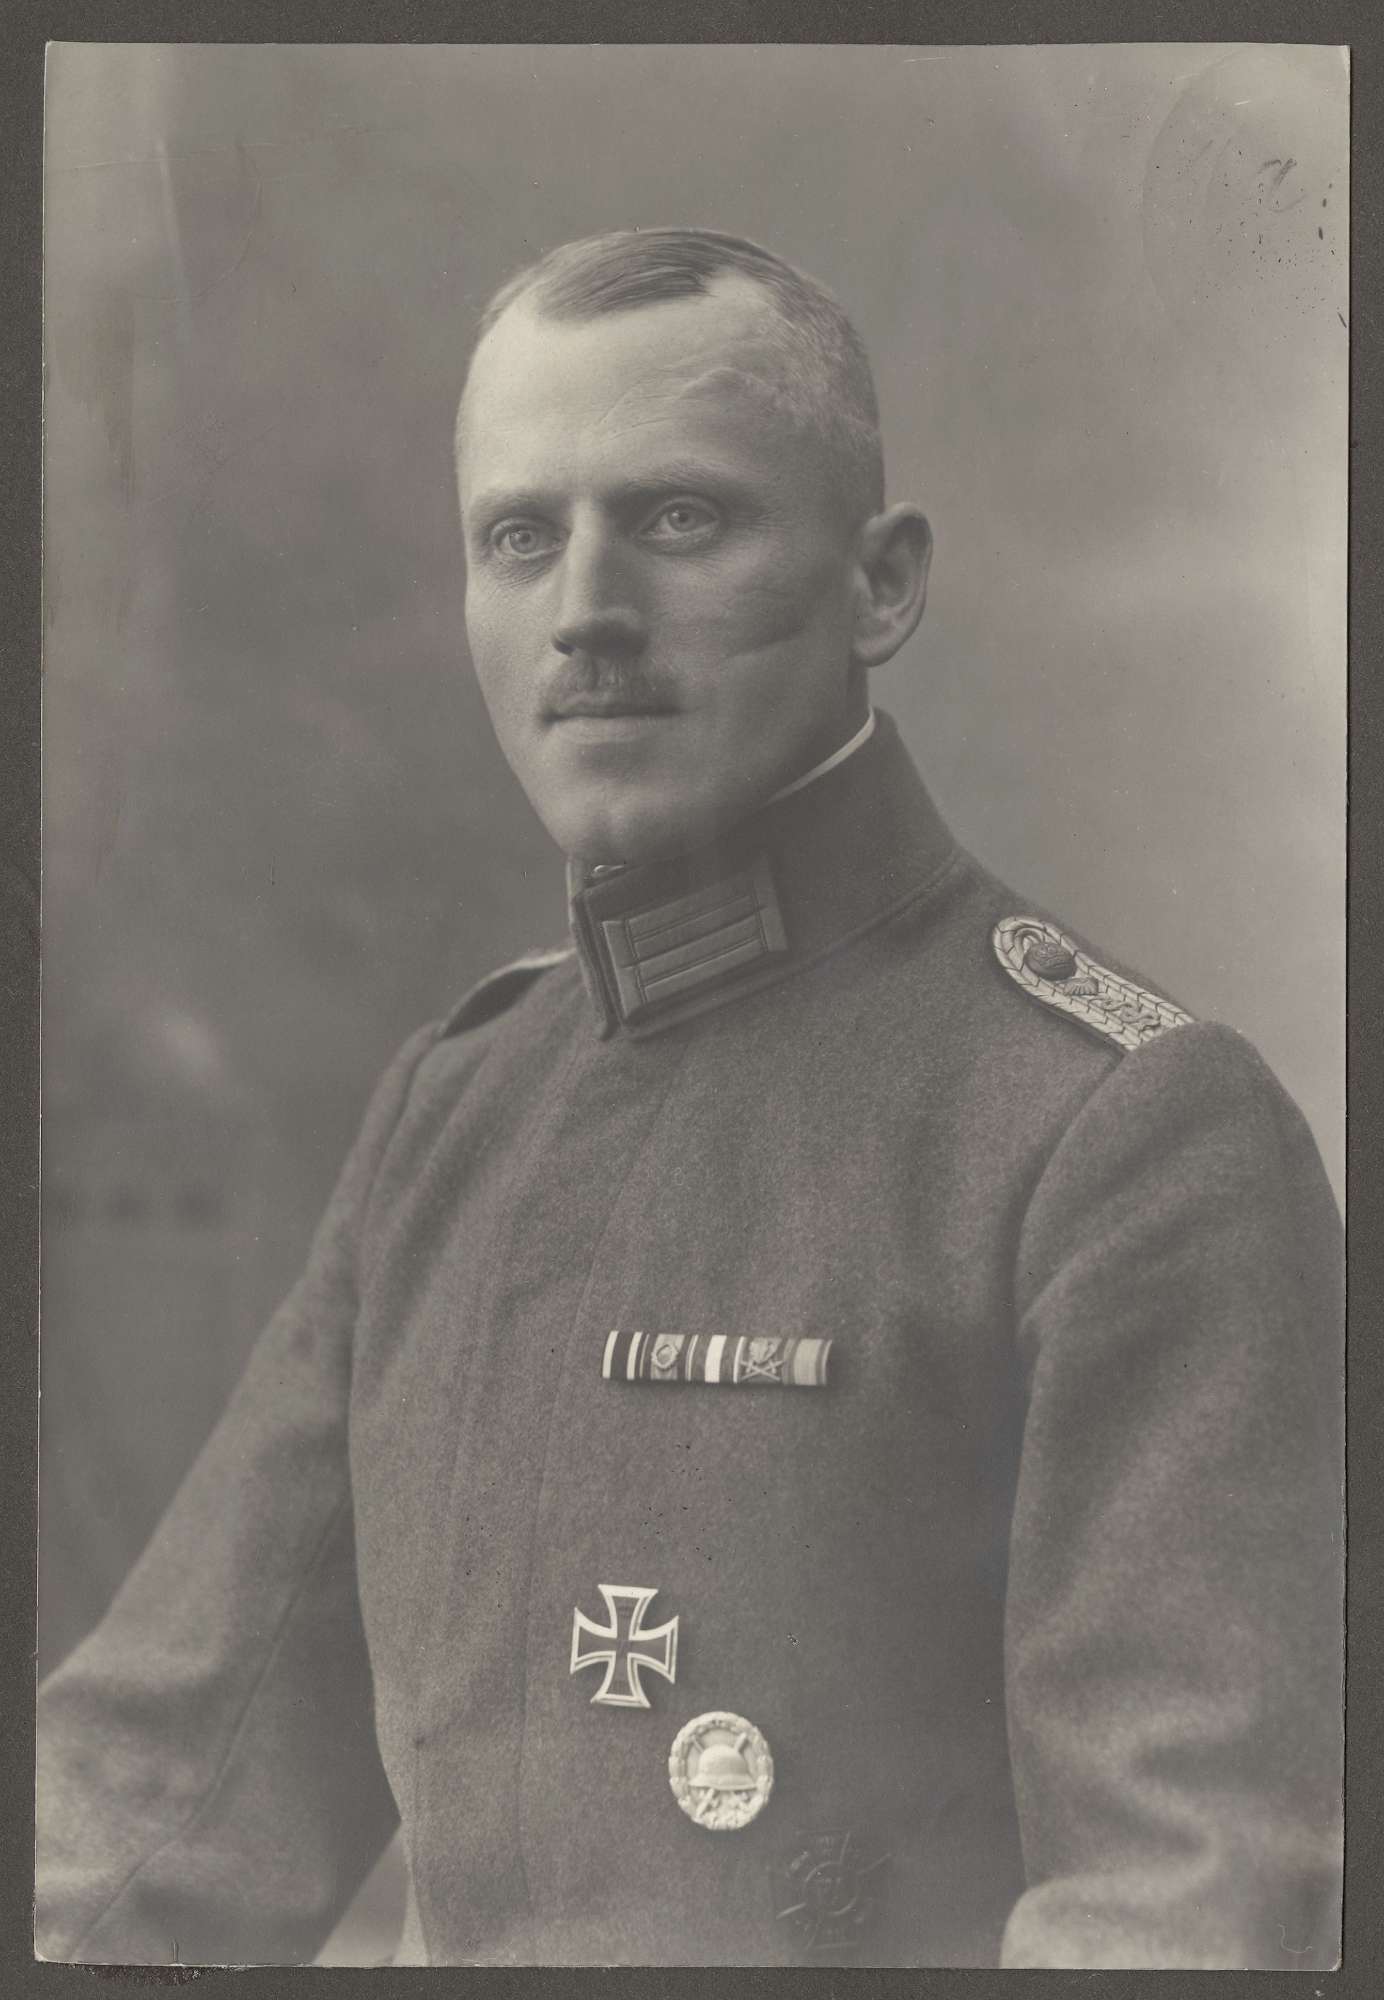 Lonhard, Erwin, Dr.med., Bild 1